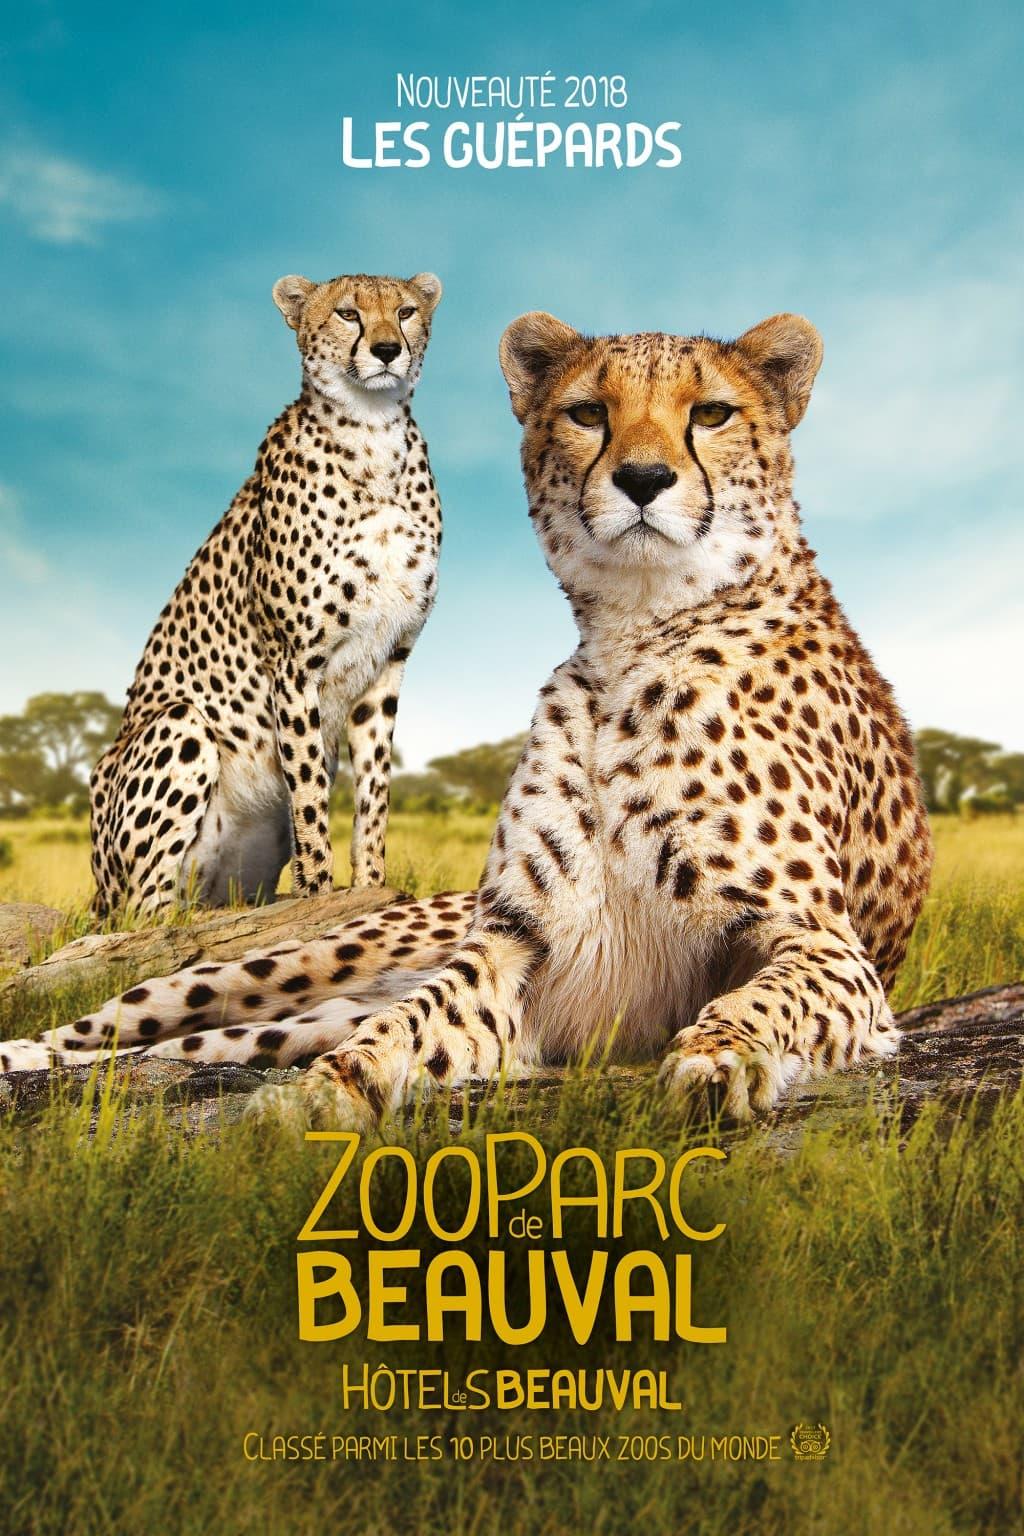 Guepard zoo de Beauval